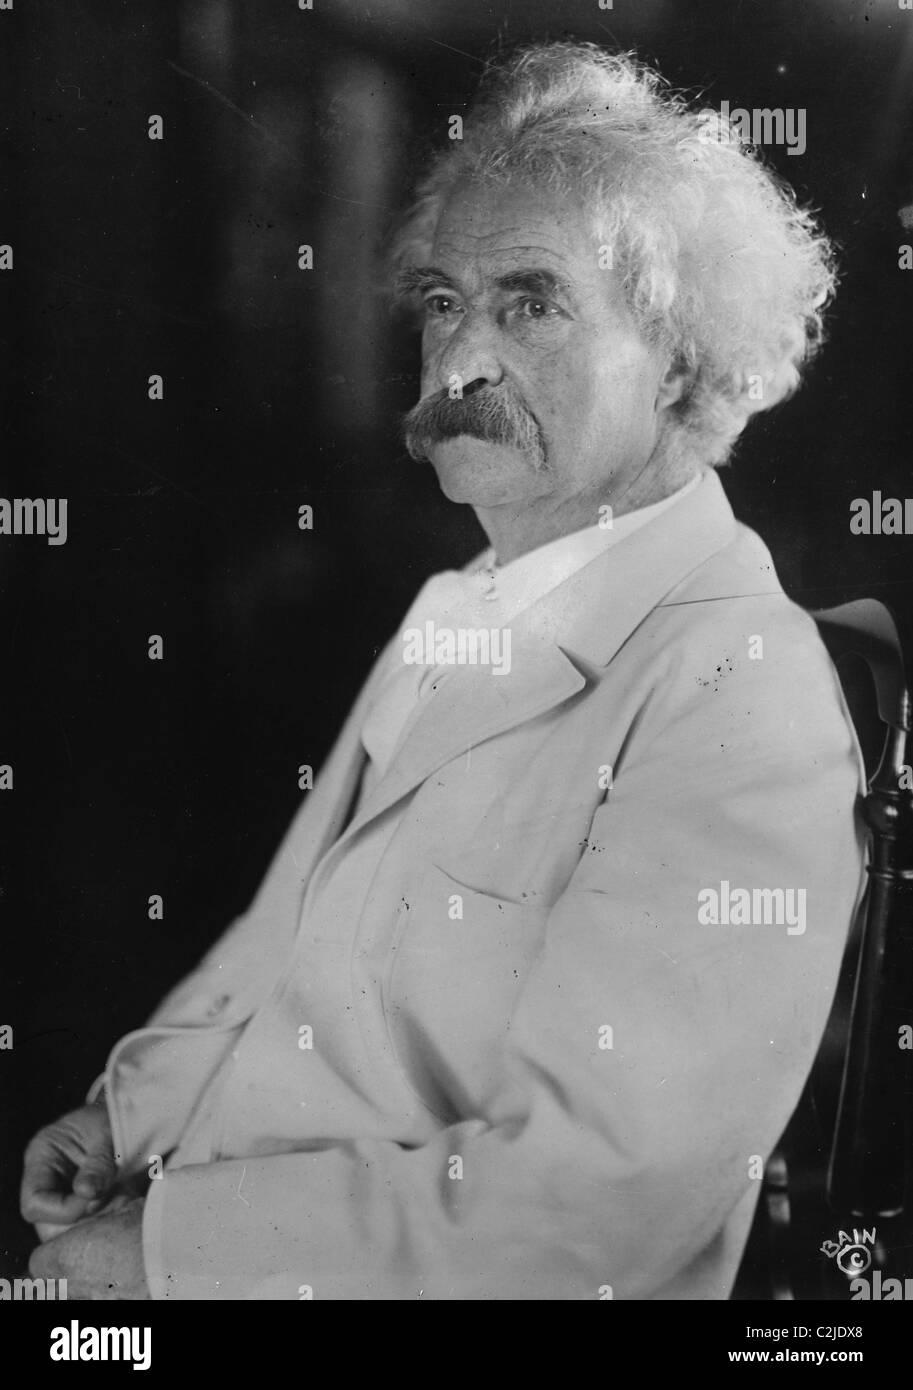 Portrait of Mark Twain - Stock Image